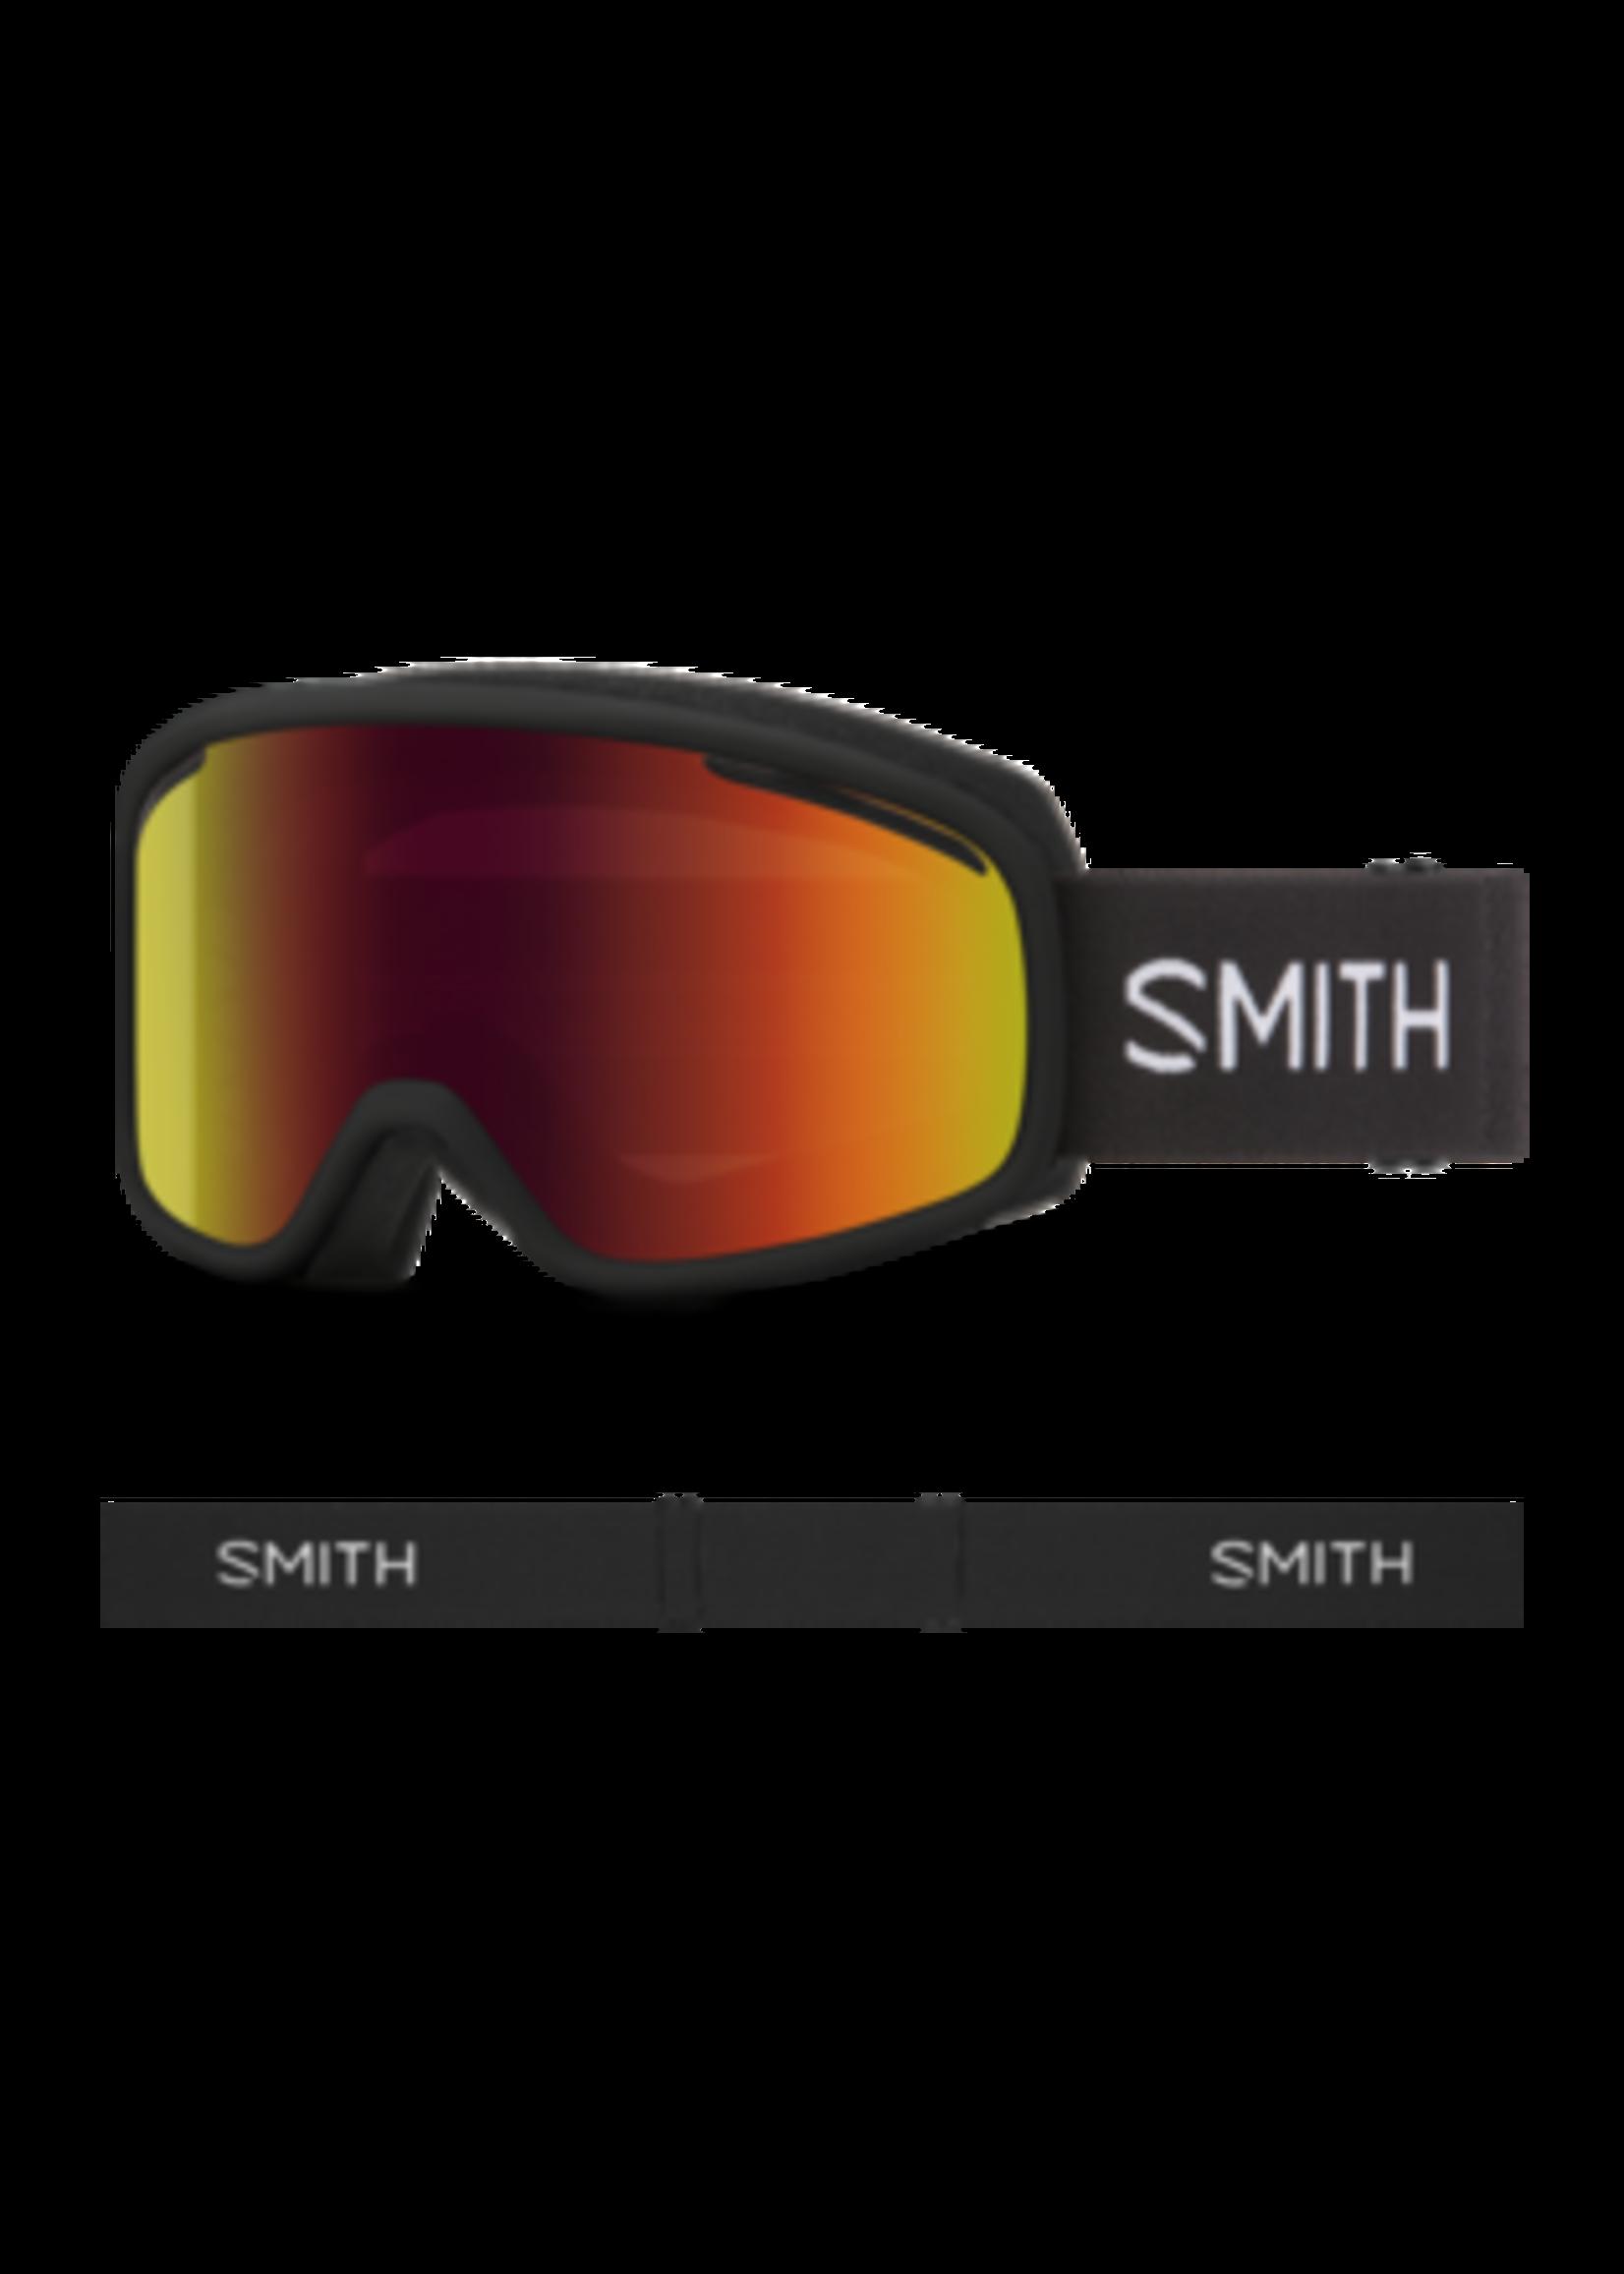 Smith- Vogue